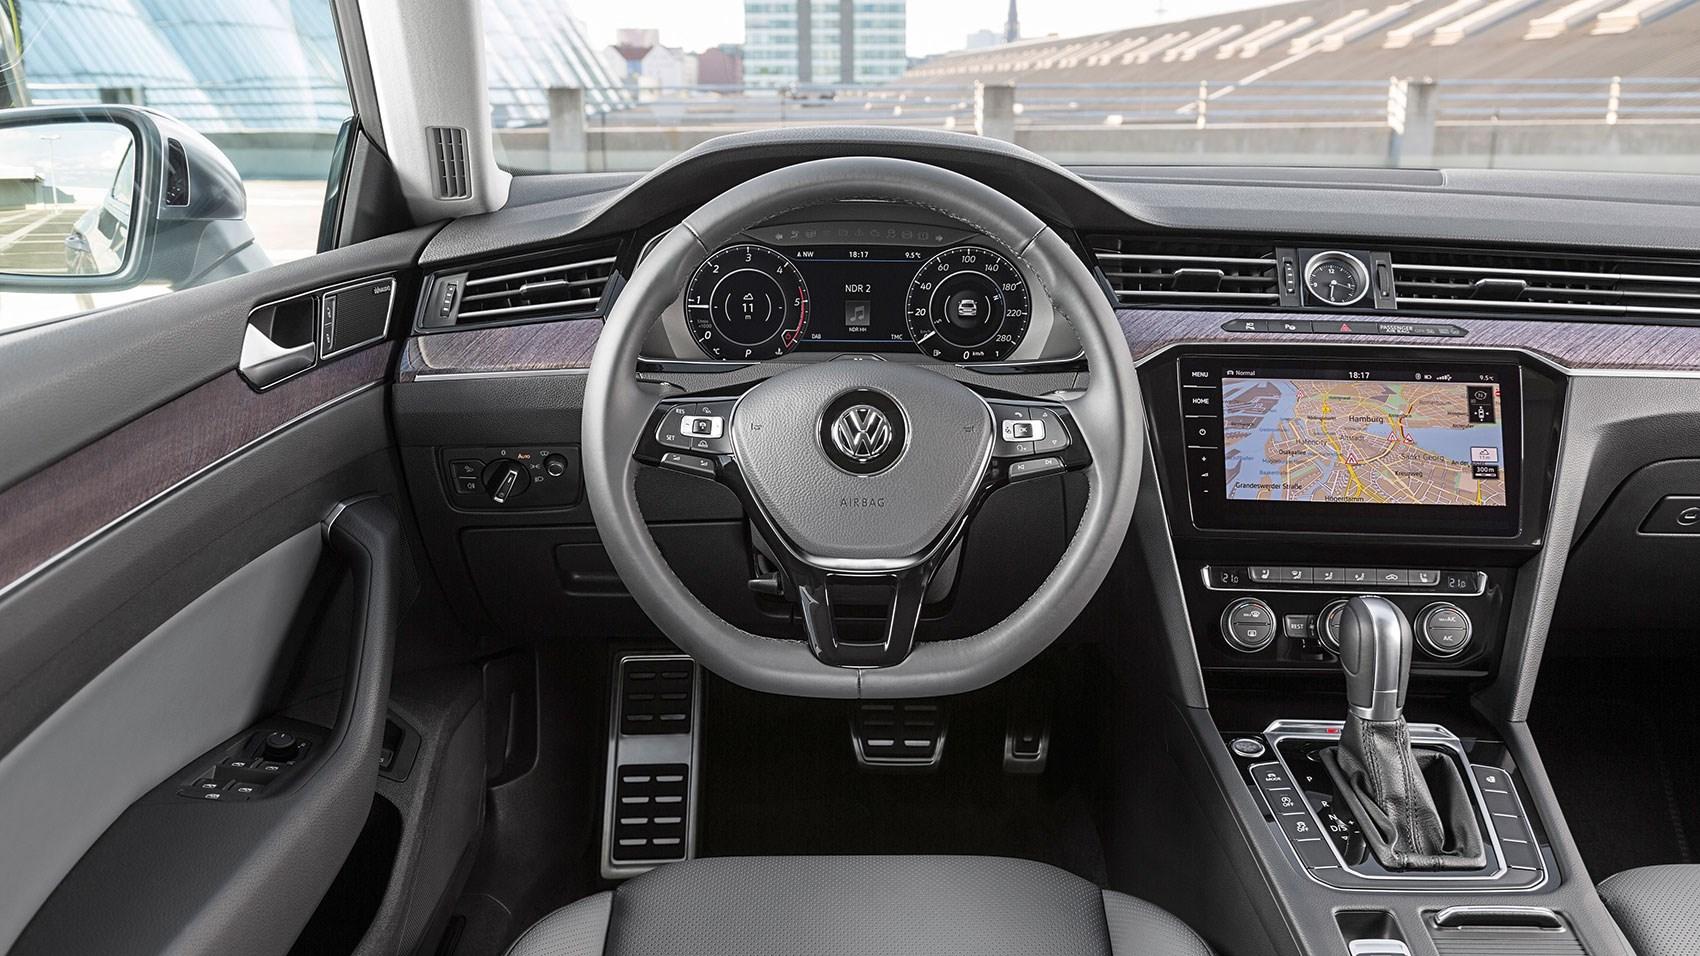 Volkswagen passat review 2017 autocar -  Vw Arteon Interior A Typically Classy Cabin